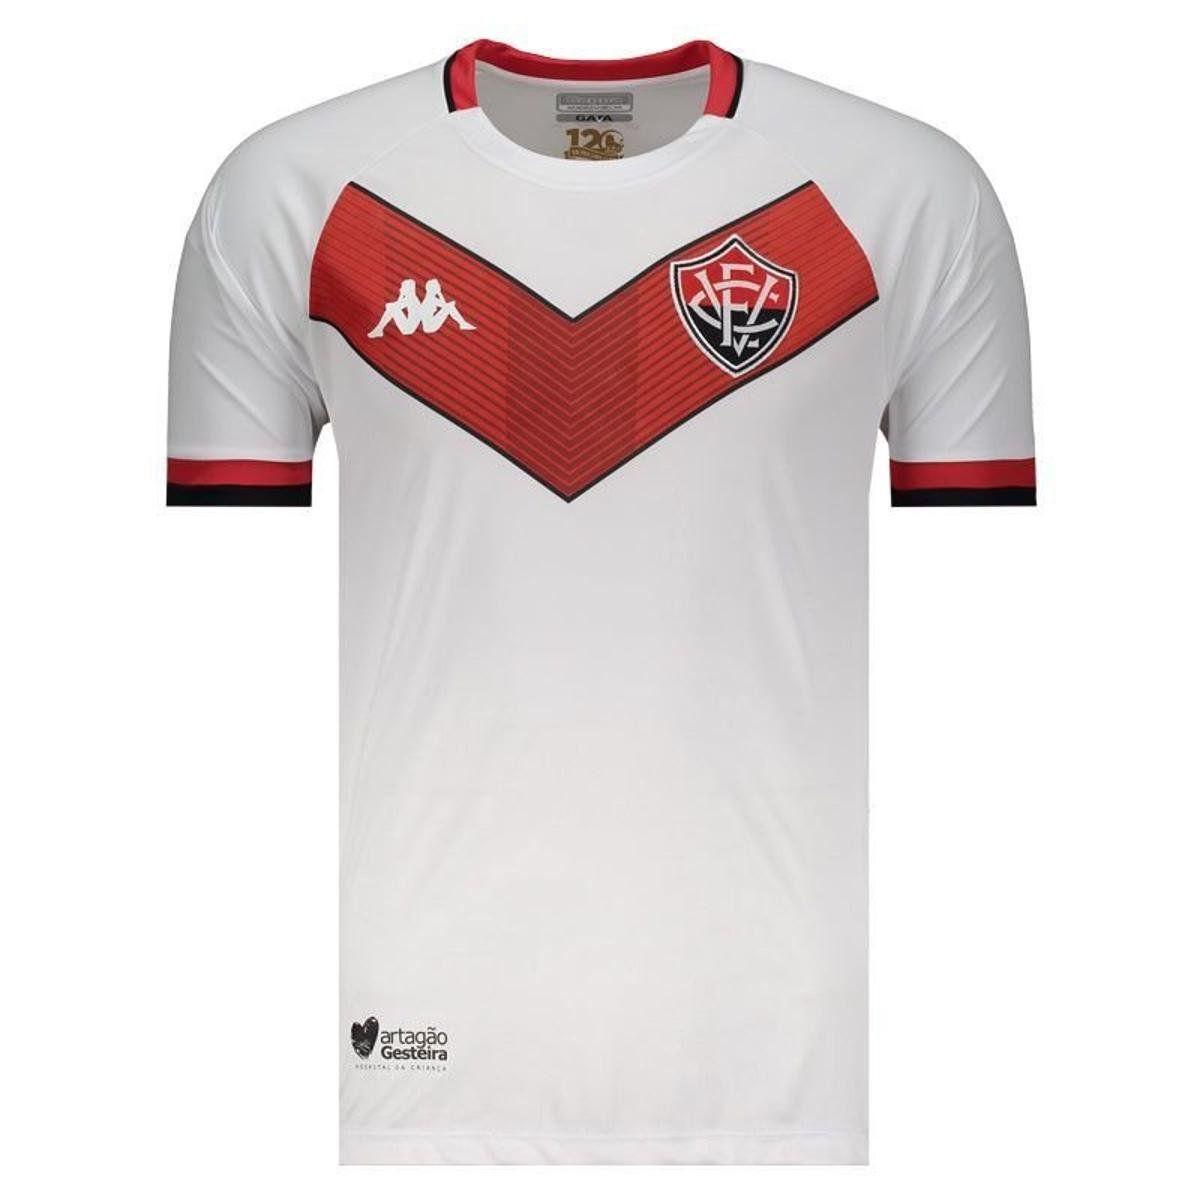 Camisa Jogo II - Kappa - 2019 - Masculina - Branco